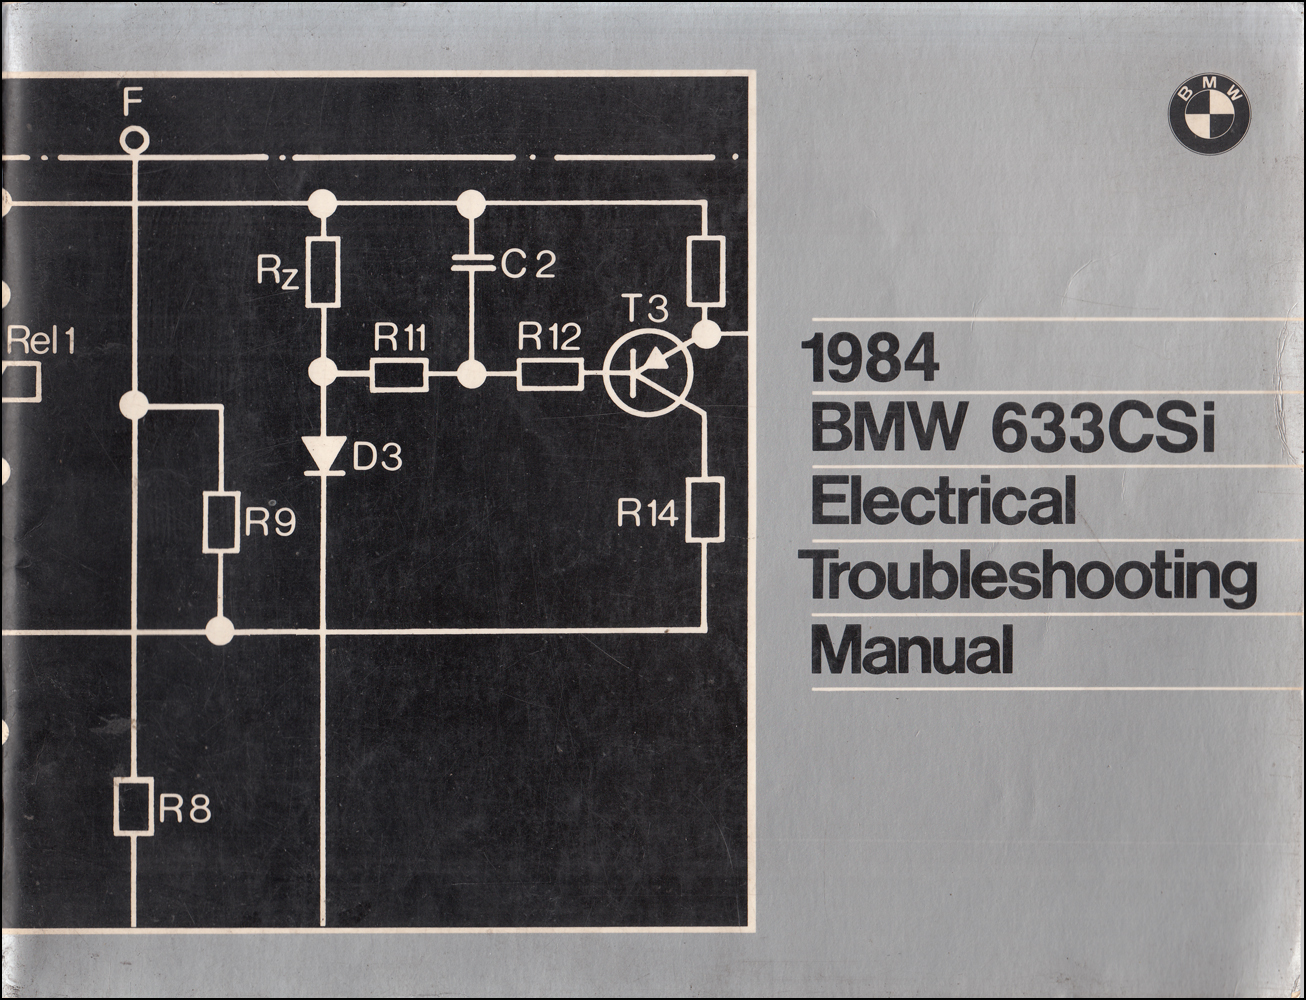 1984 BMW 633CSi Electrical Troubleshooting Manual Original Bmw Csi Wiring Diagram on bmw 645 csi, bmw 3.0 csi, bmw 850 csi, 1982 bmw csi, bmw 8 series csi, bmw 325 csi, bmw 630 csi, bmw 628 csi, bmw m635 csi, bmw 635 csi, bmw 840 csi, 1976 bmw csi, bmw 633 cs,